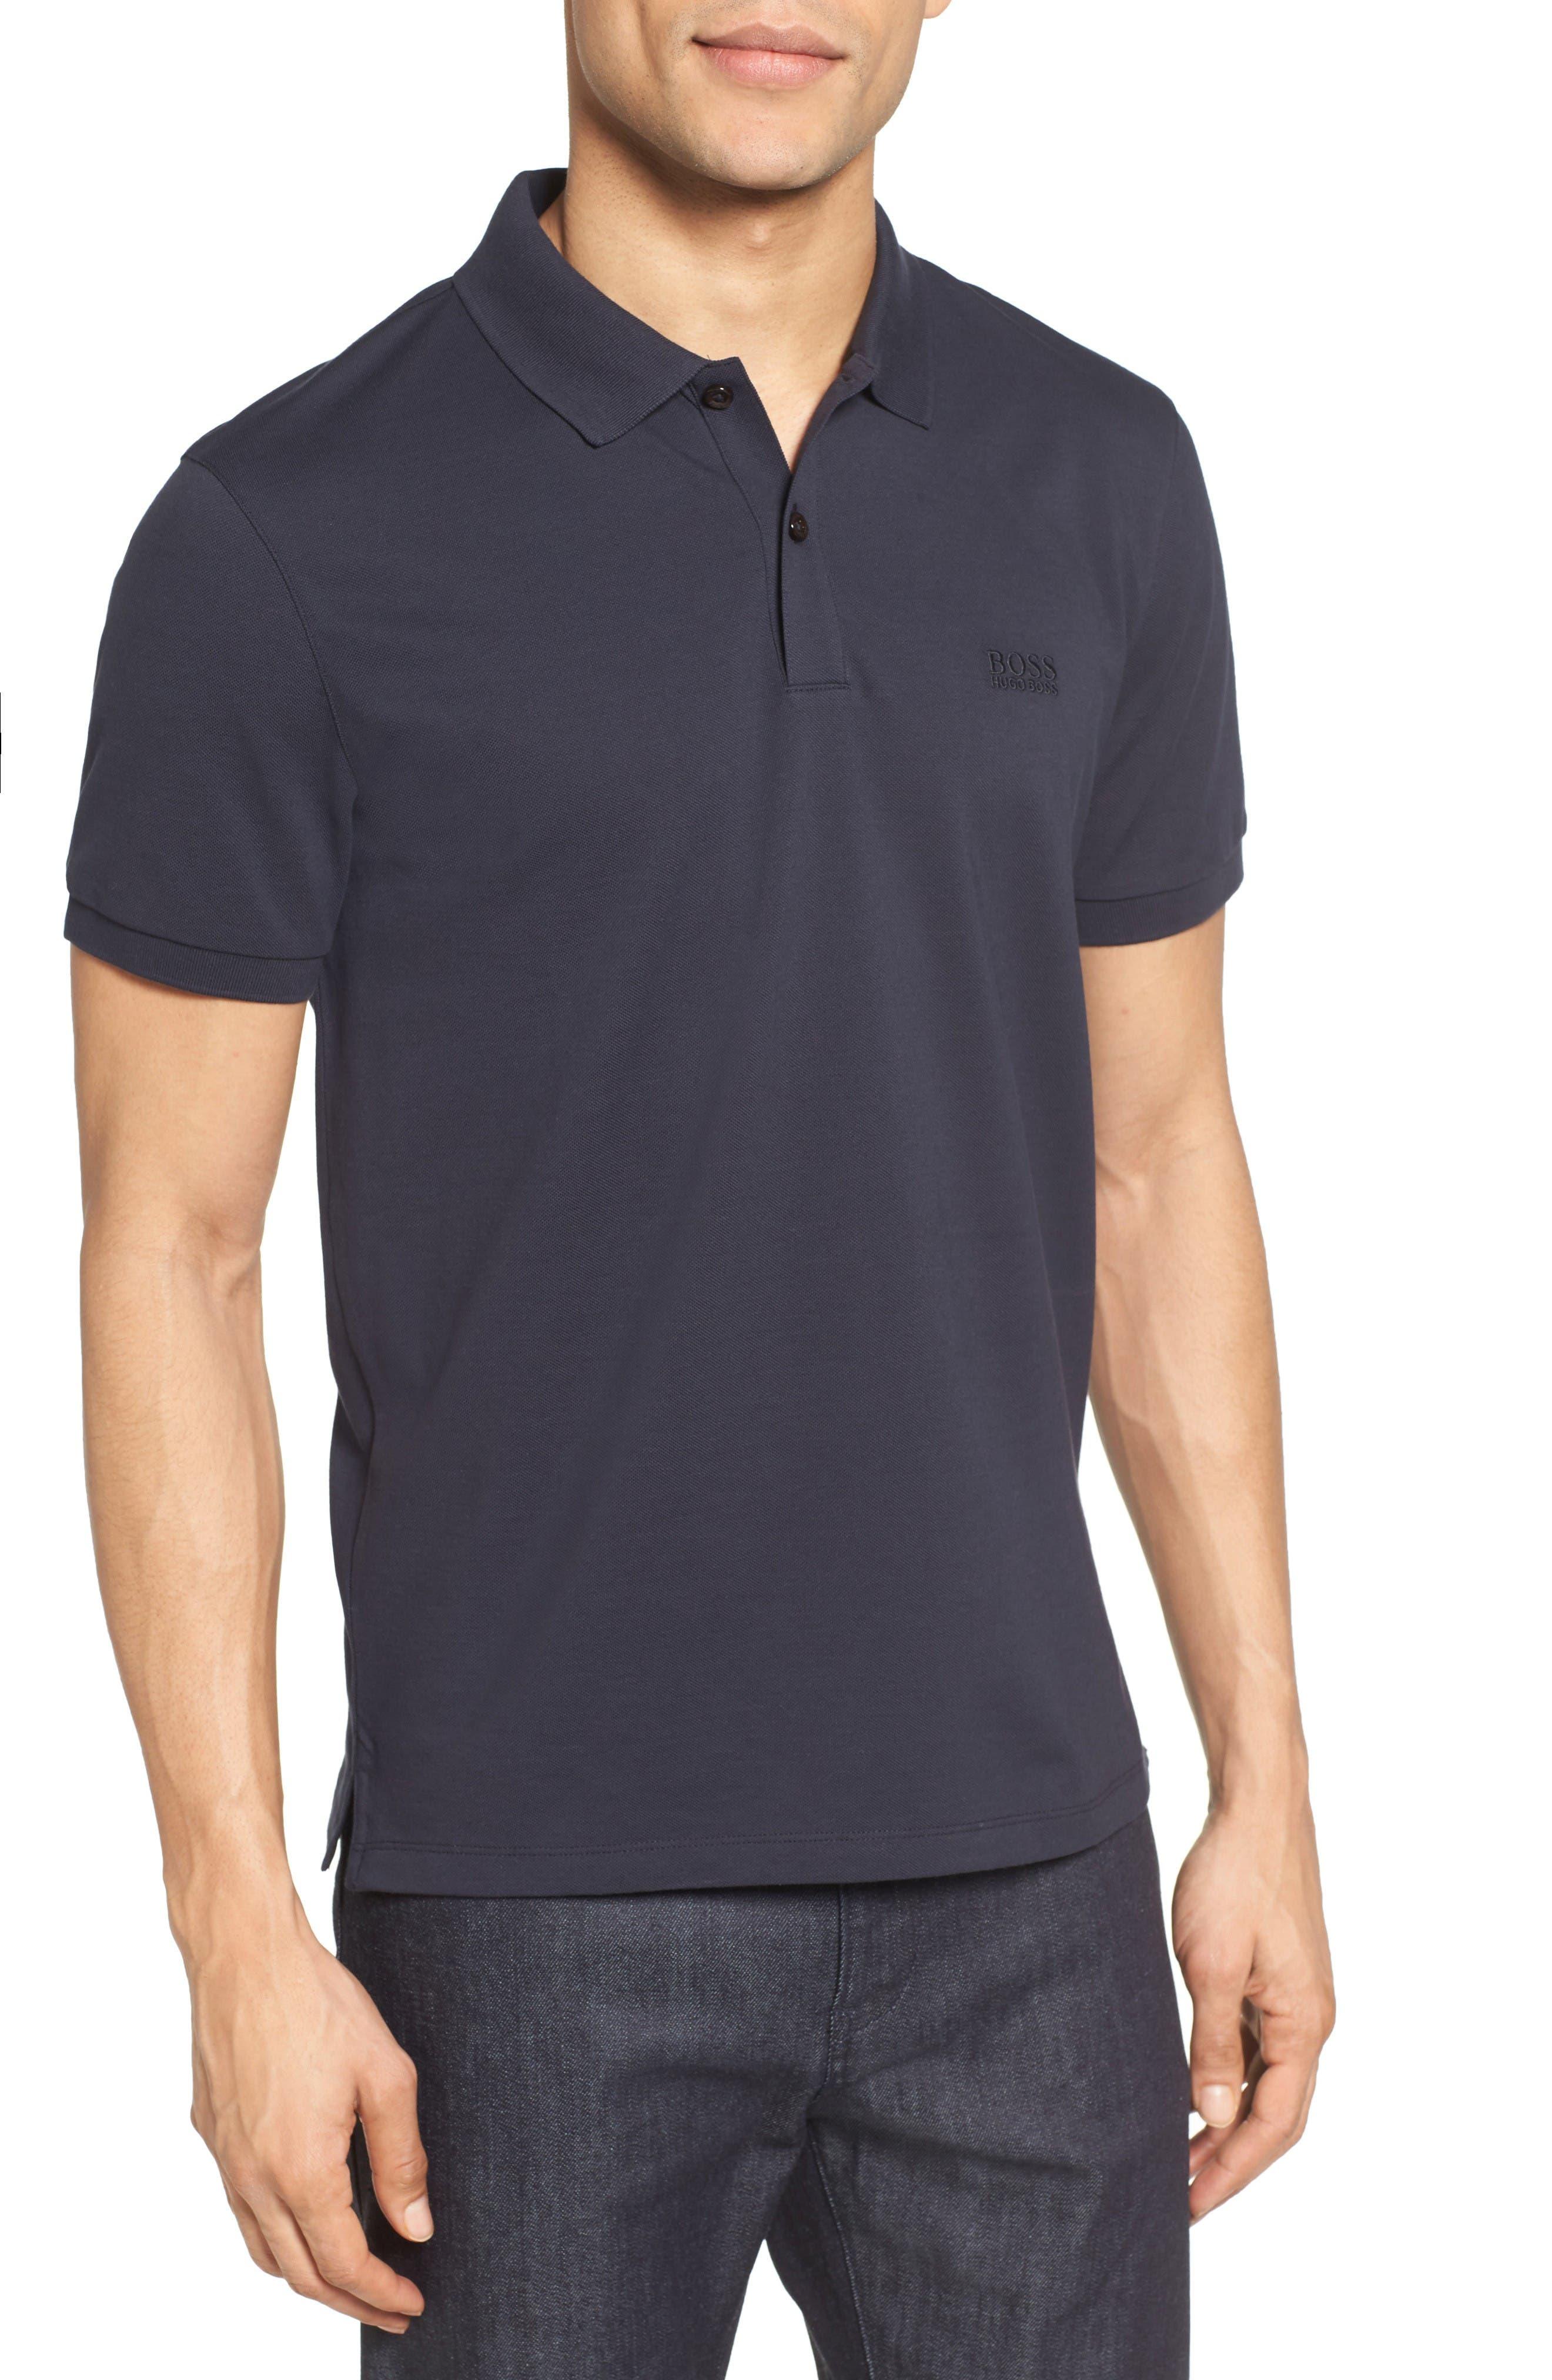 Main Image - BOSS 'Pallas' Regular Fit Logo Embroidered Polo Shirt